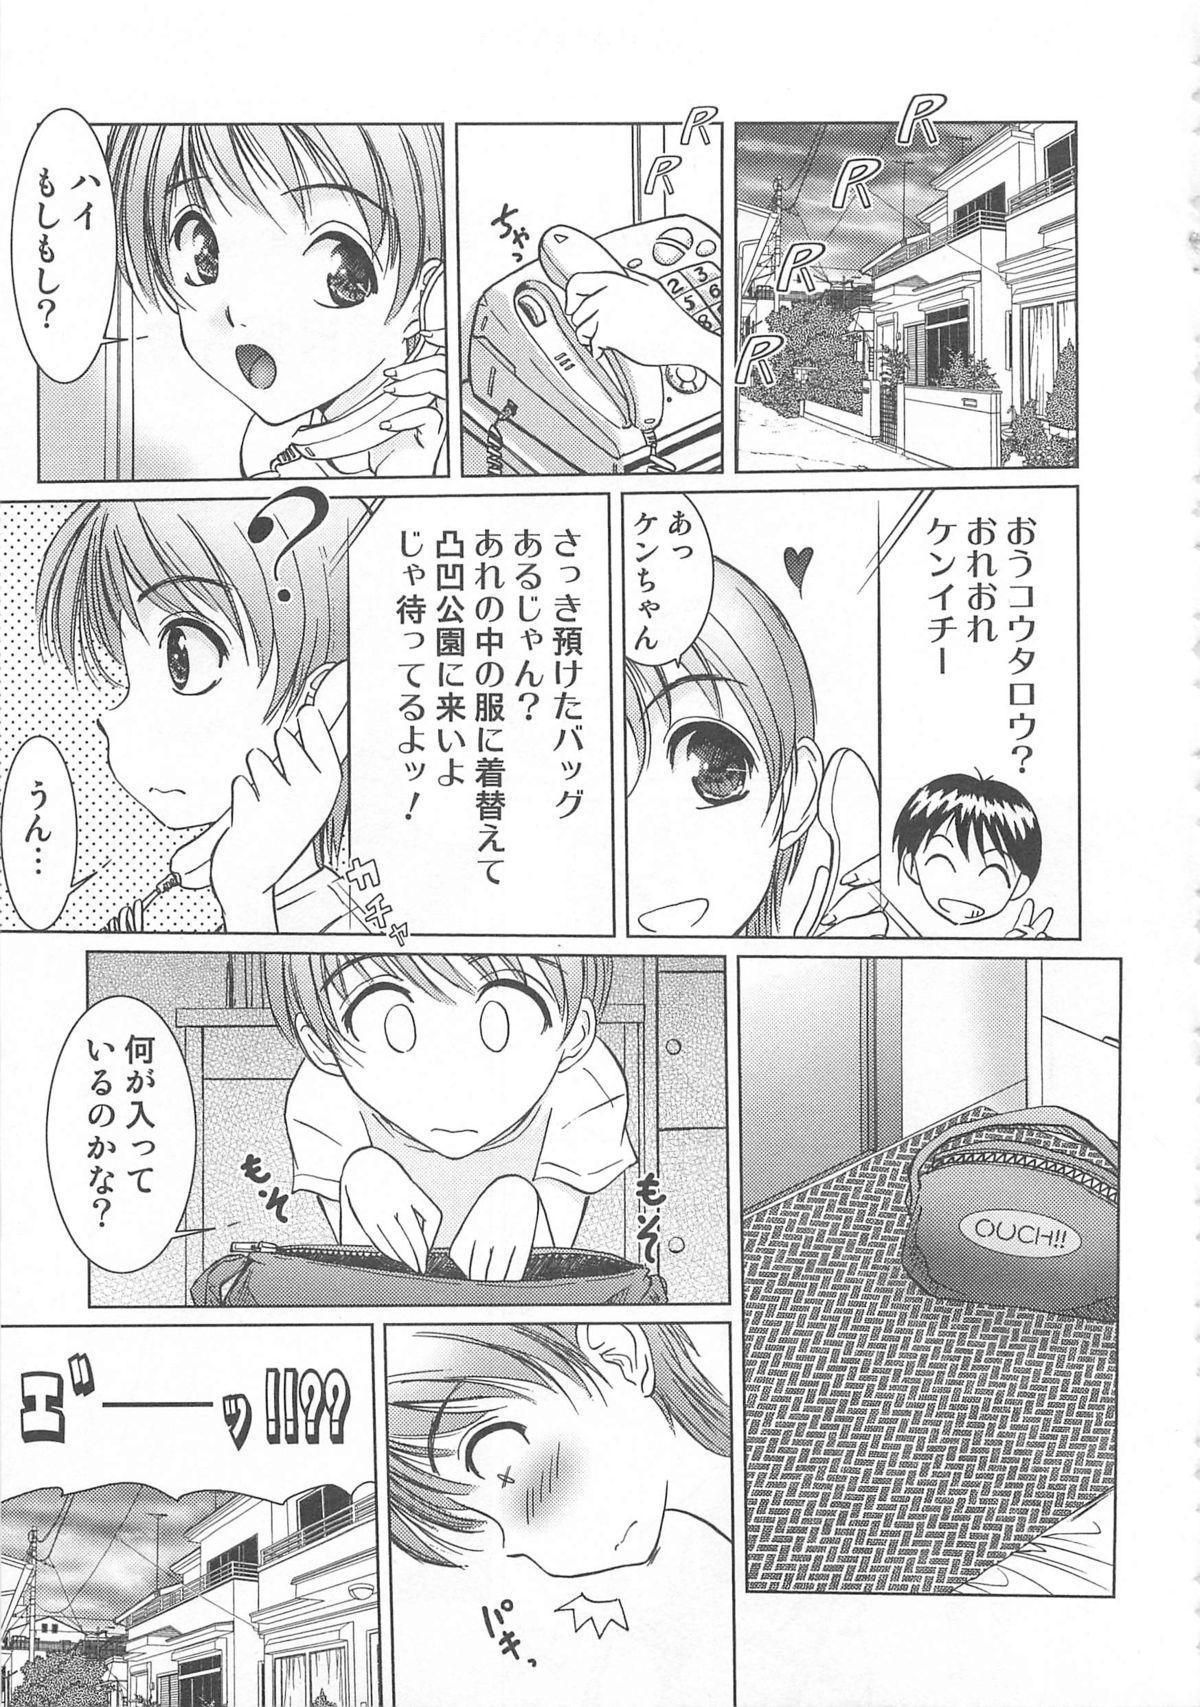 Otokonoko HEAVEN Vol. 02 Dokidoki Chikan Taiken 63